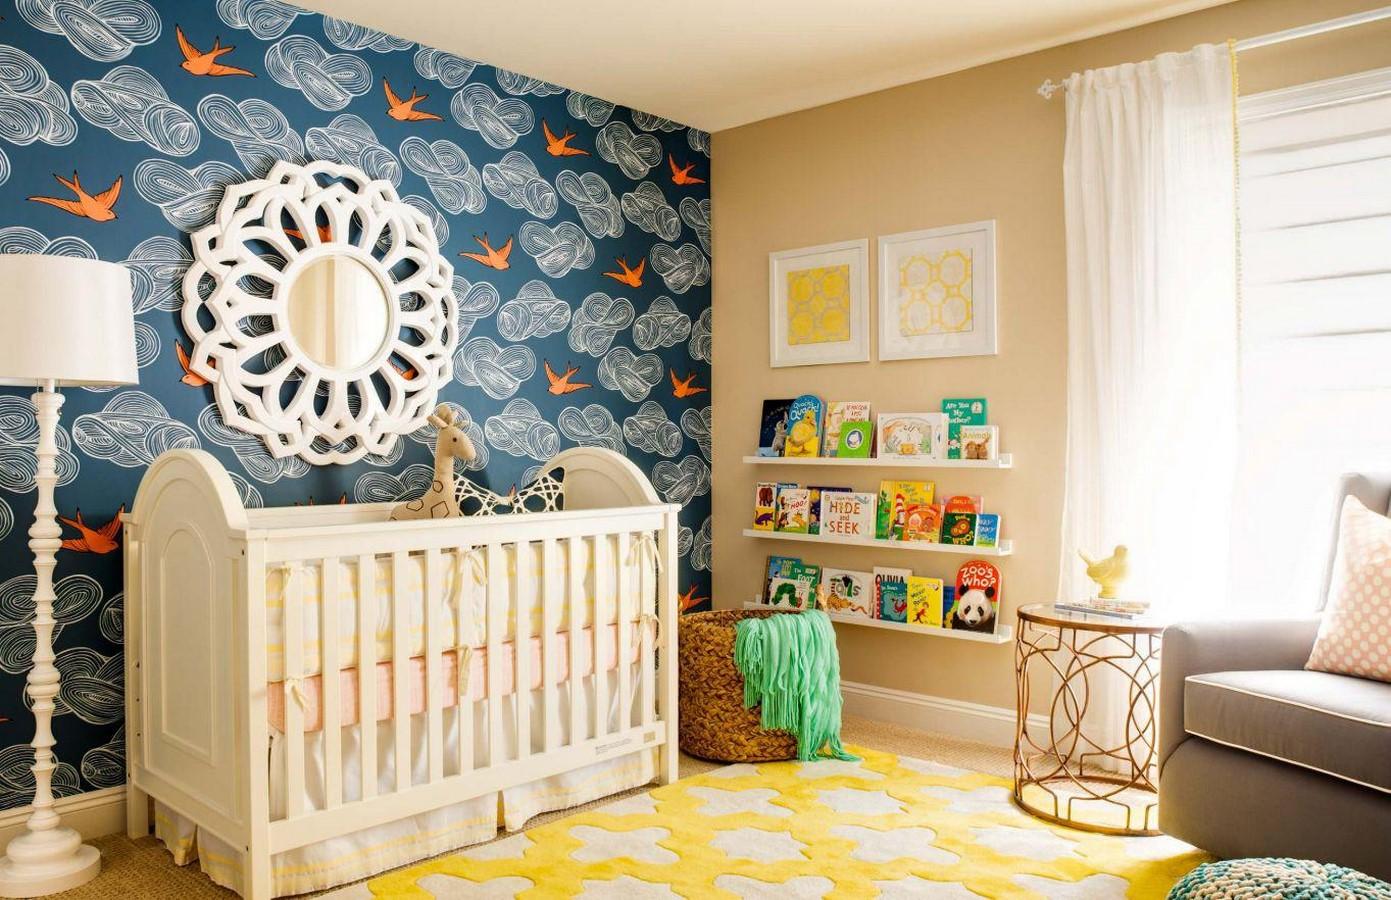 30 Elegant Child's Nursery designs ideas - Sheet7